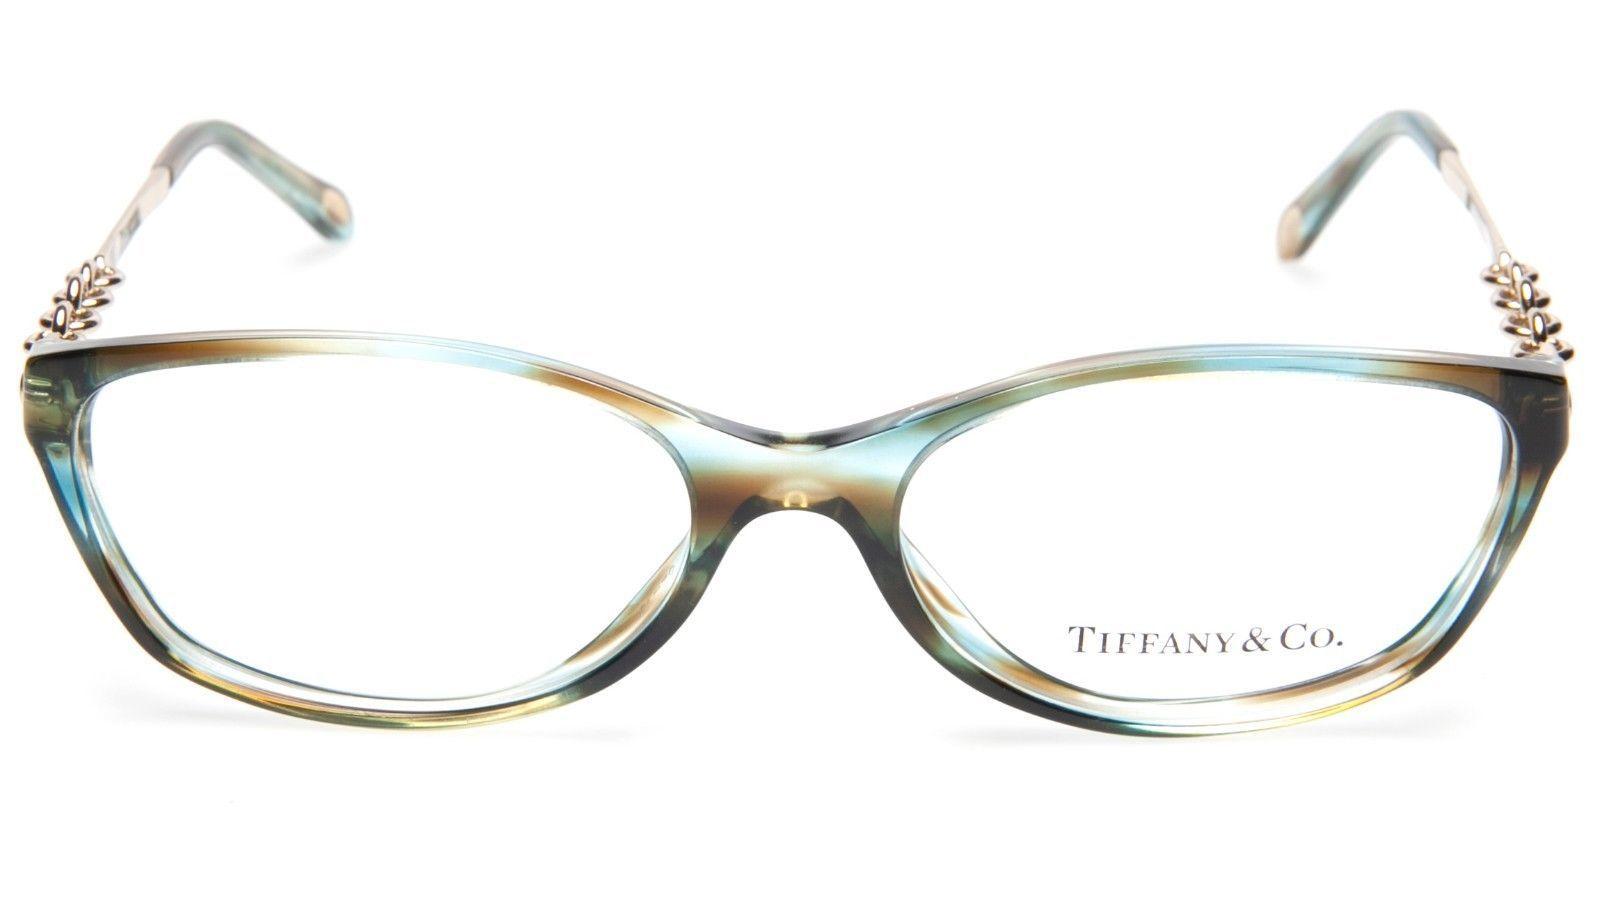 88682cd3887 NEW TIFFANY   Co. TF 2063 8124 OCEAN TURQUOISE EYEGLASSES 52-16-135